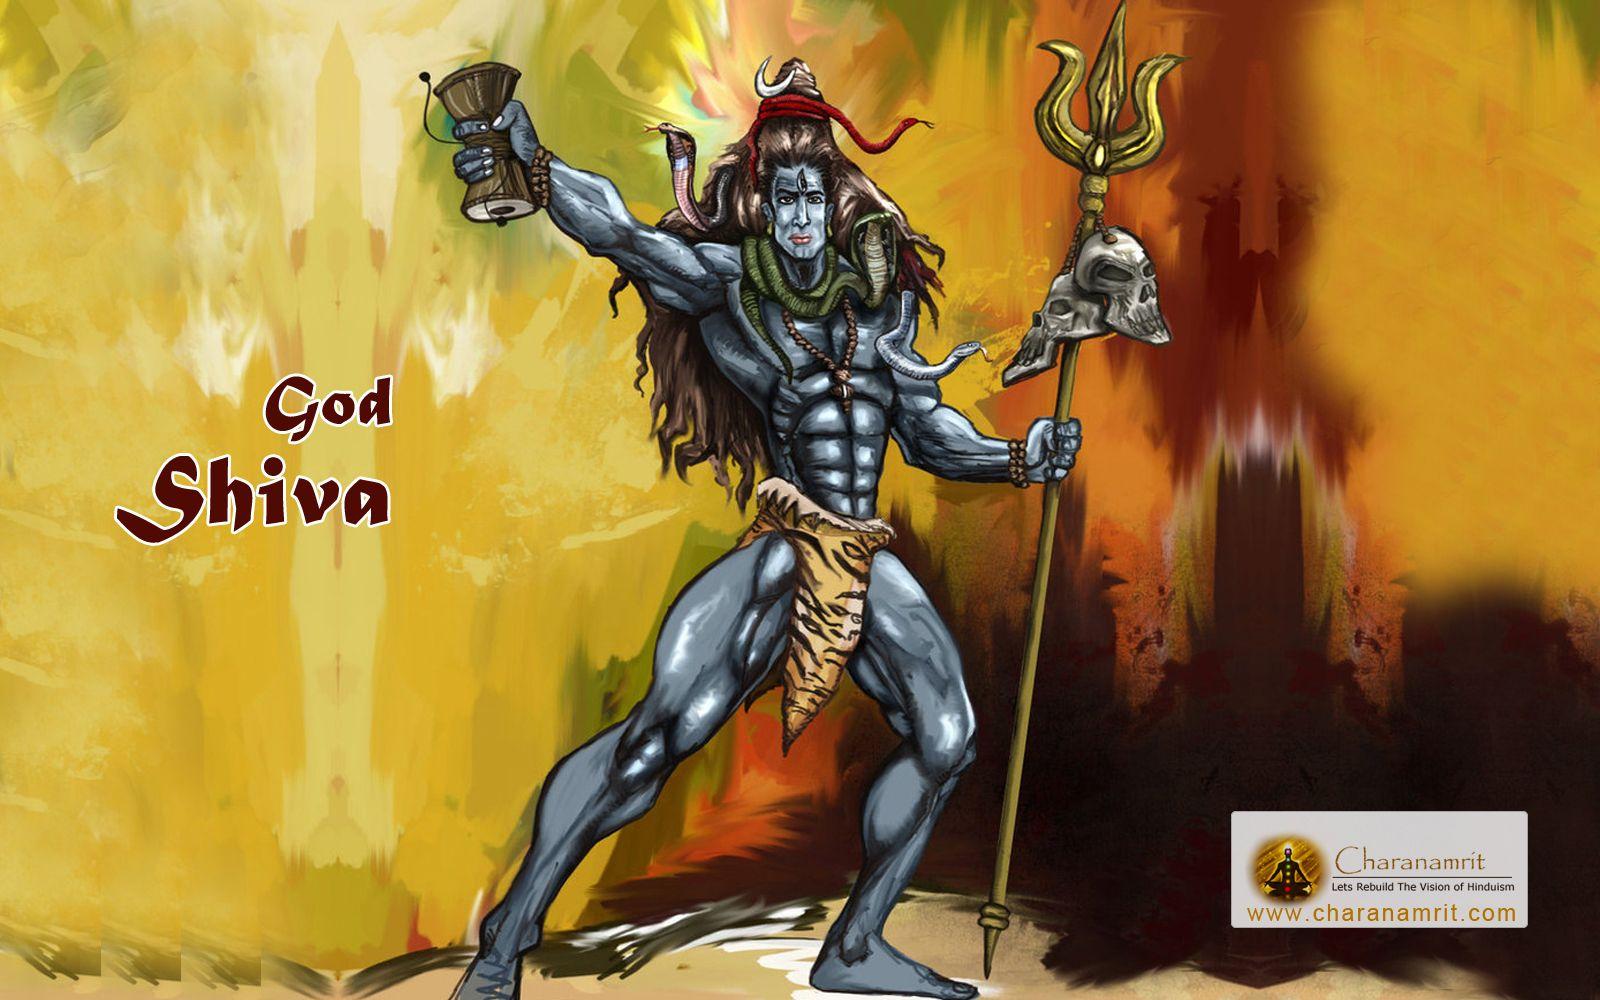 Must see Wallpaper Angry Shiva - 5c143e6e82fb1e75ef9d961a423482b0  Trends_851356      .jpg